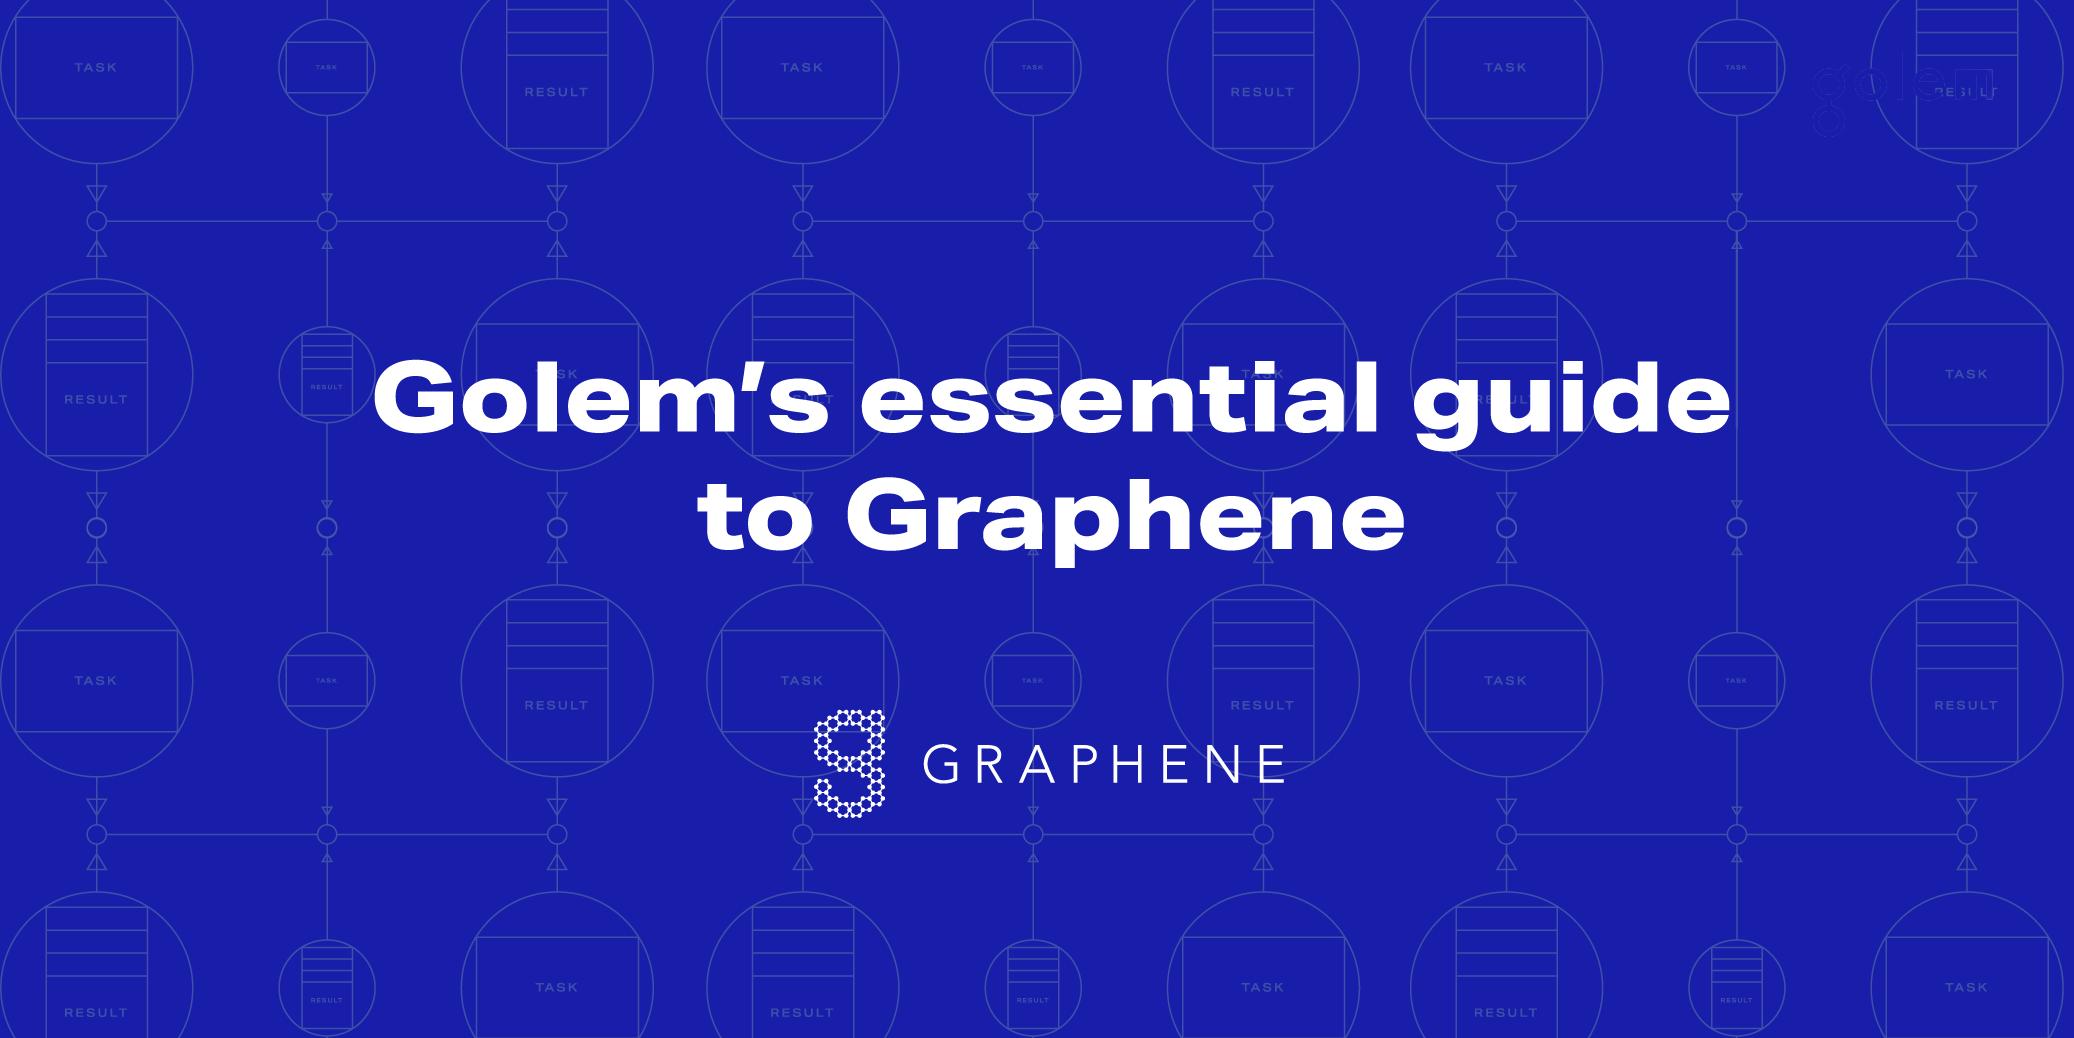 Golem's essential guide to Graphene